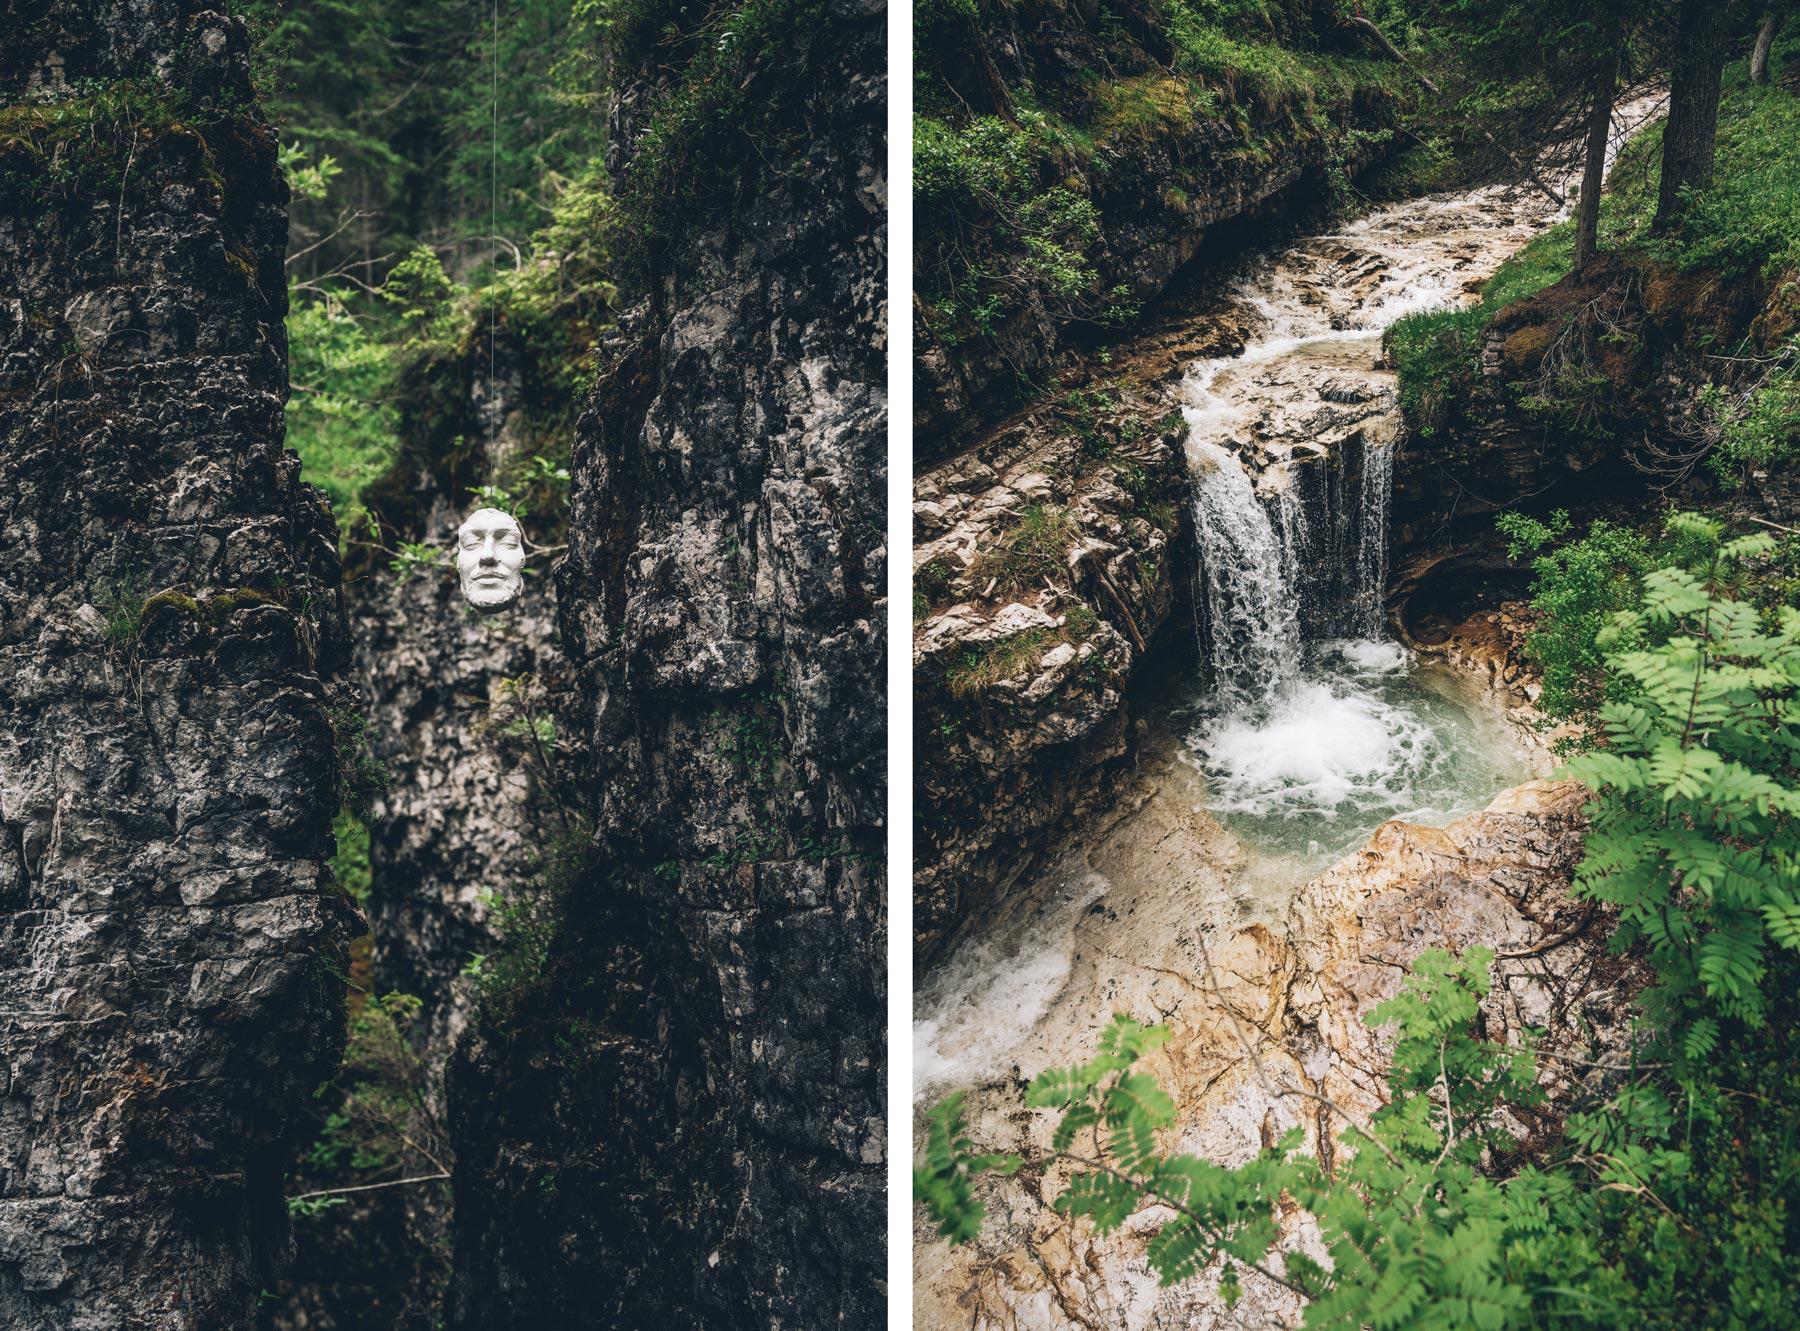 Gores de Federa, Dolomites